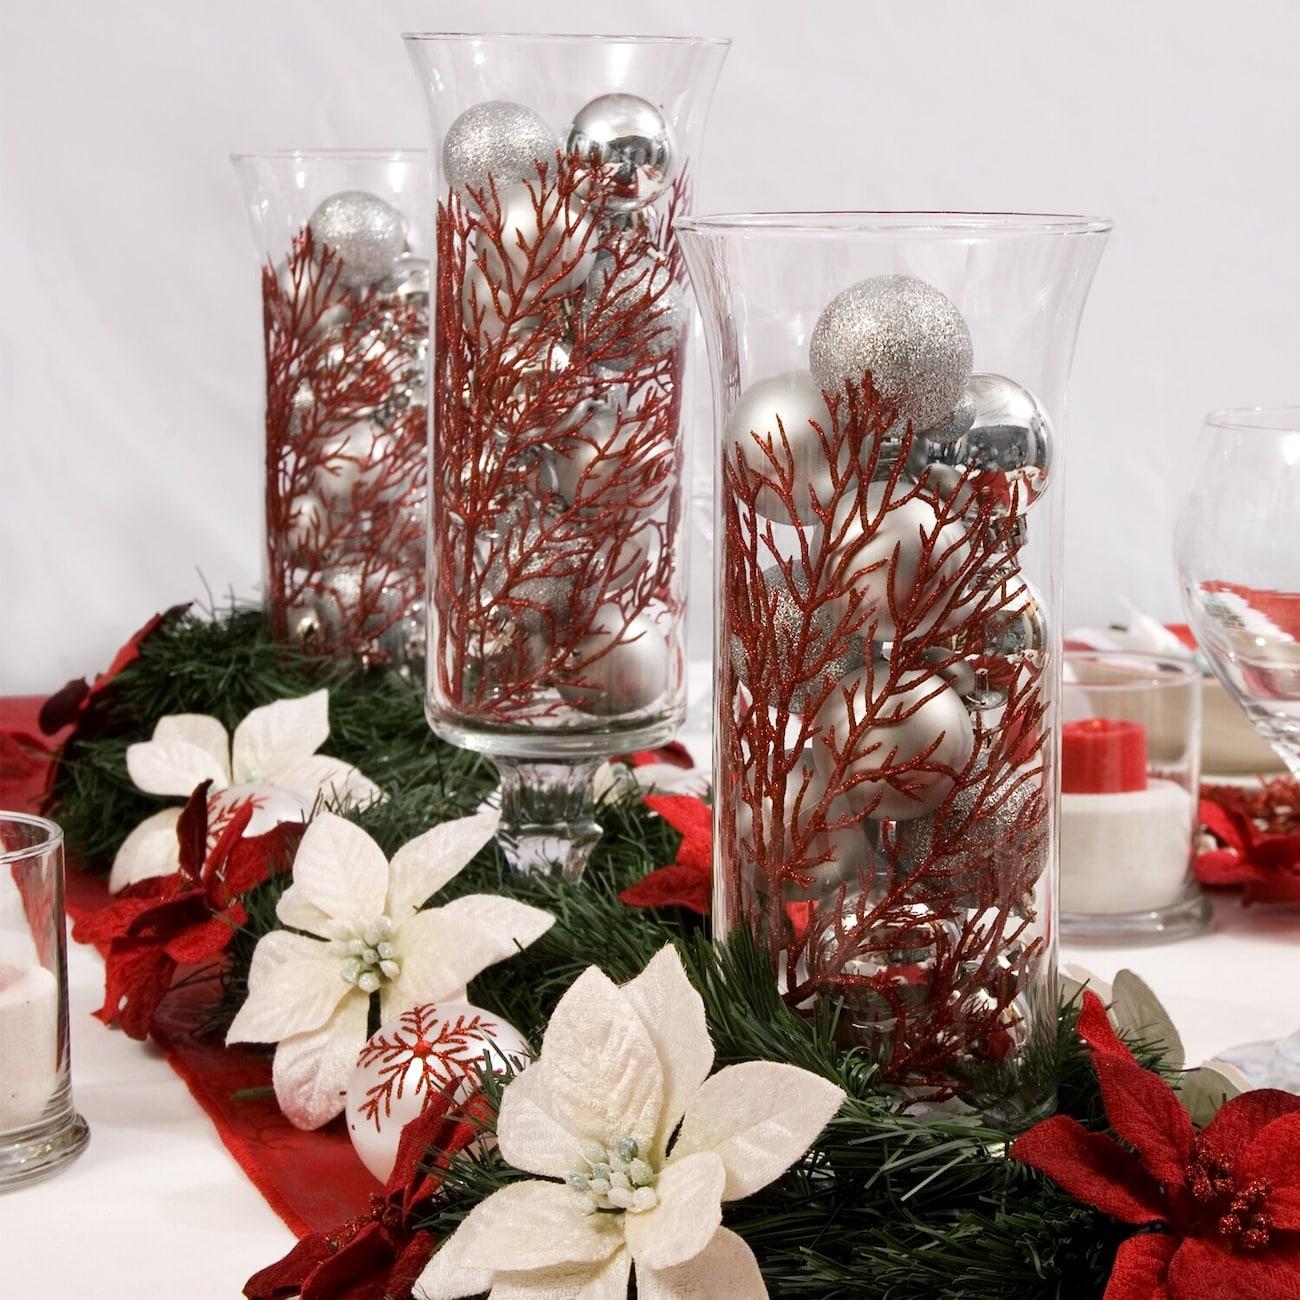 Christmas Centerpiece Ideas - Dollar Tree, Inc.